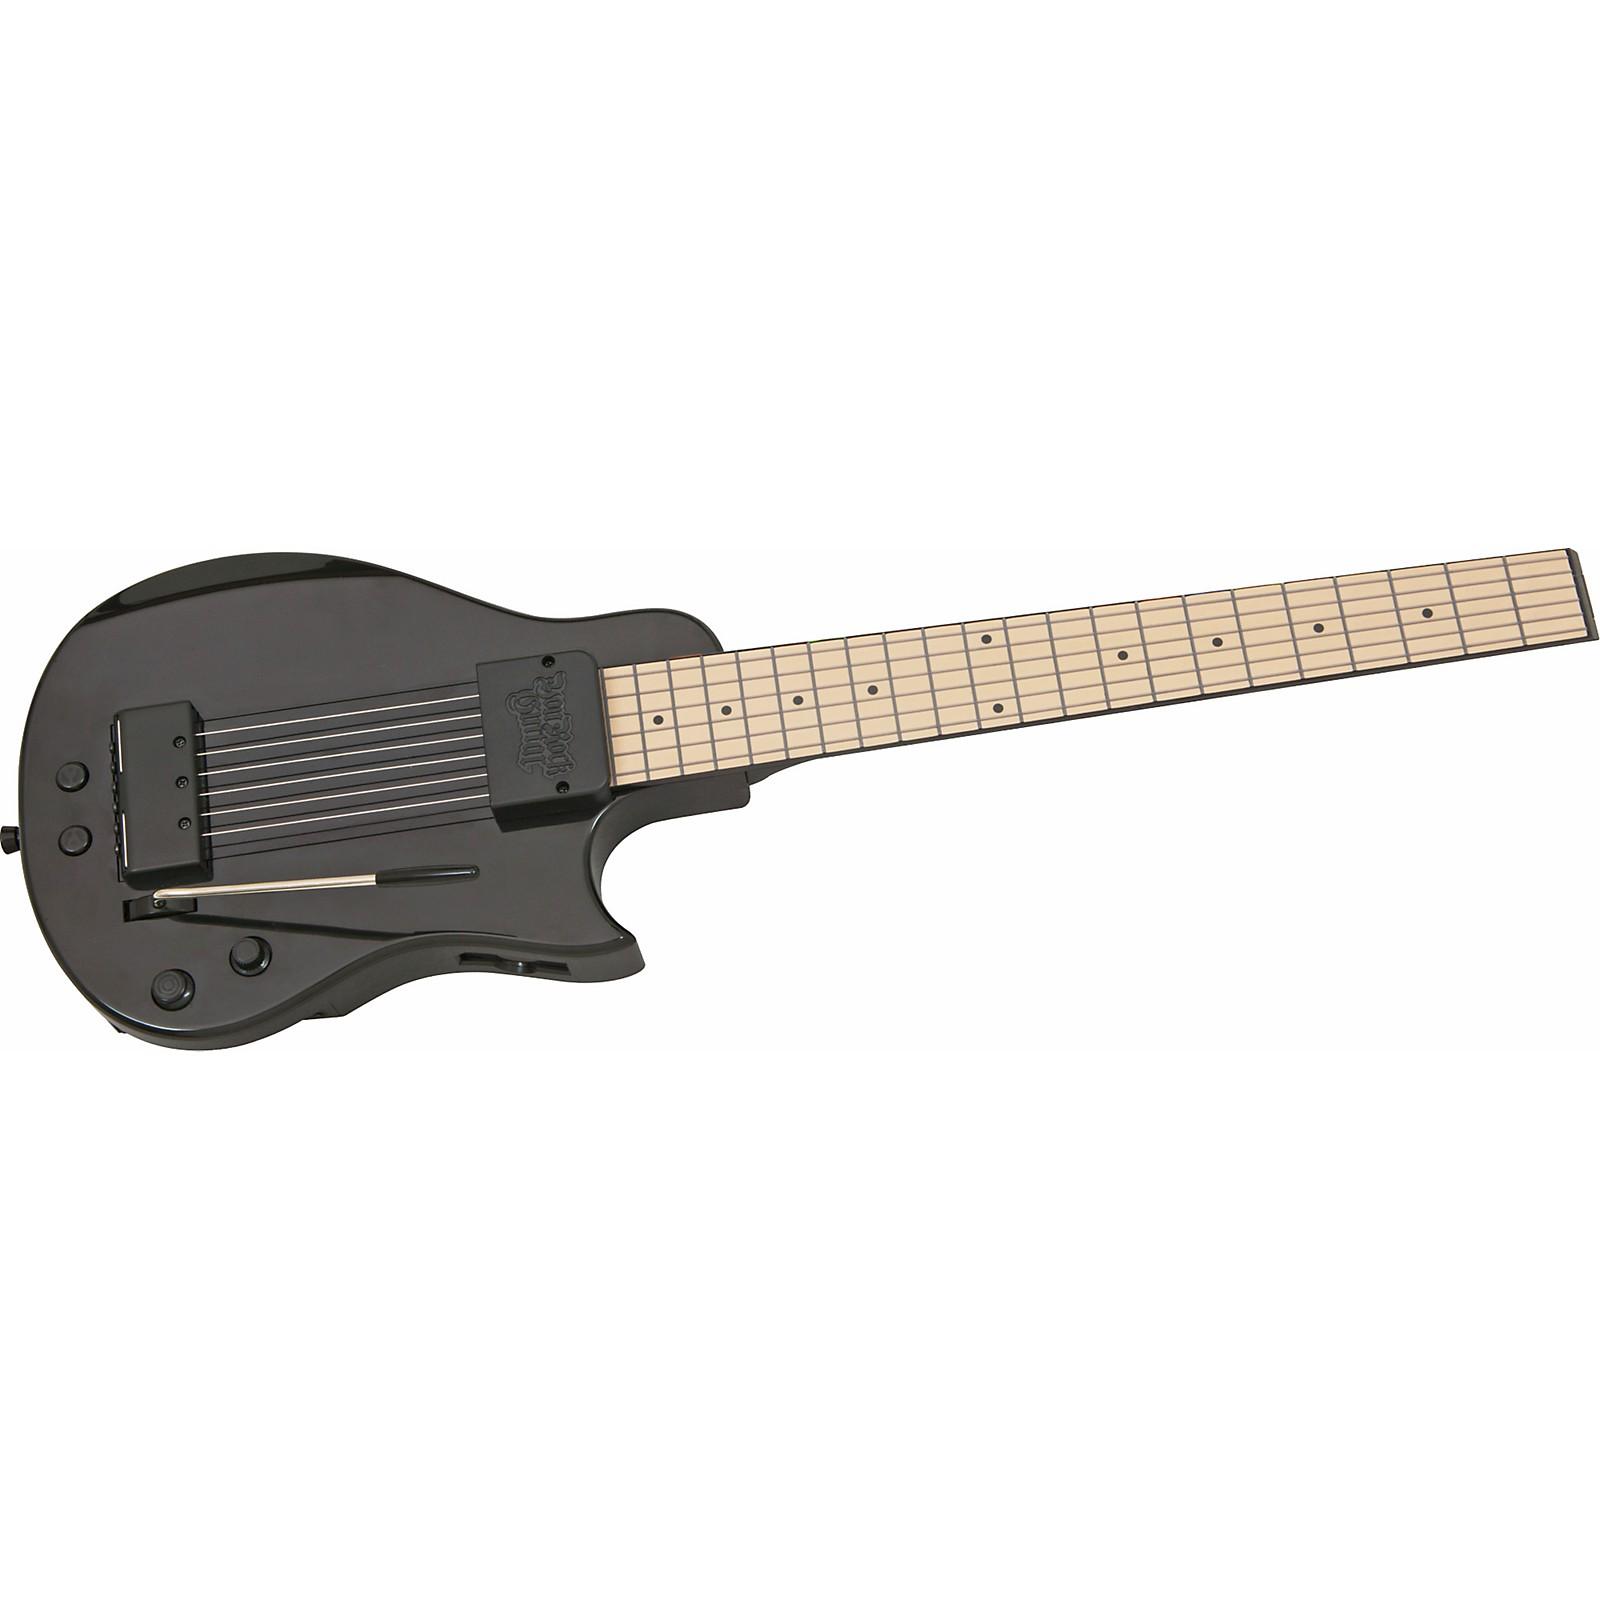 You Rock Guitar YRG-1000 MIDI Controller Electric Guitar